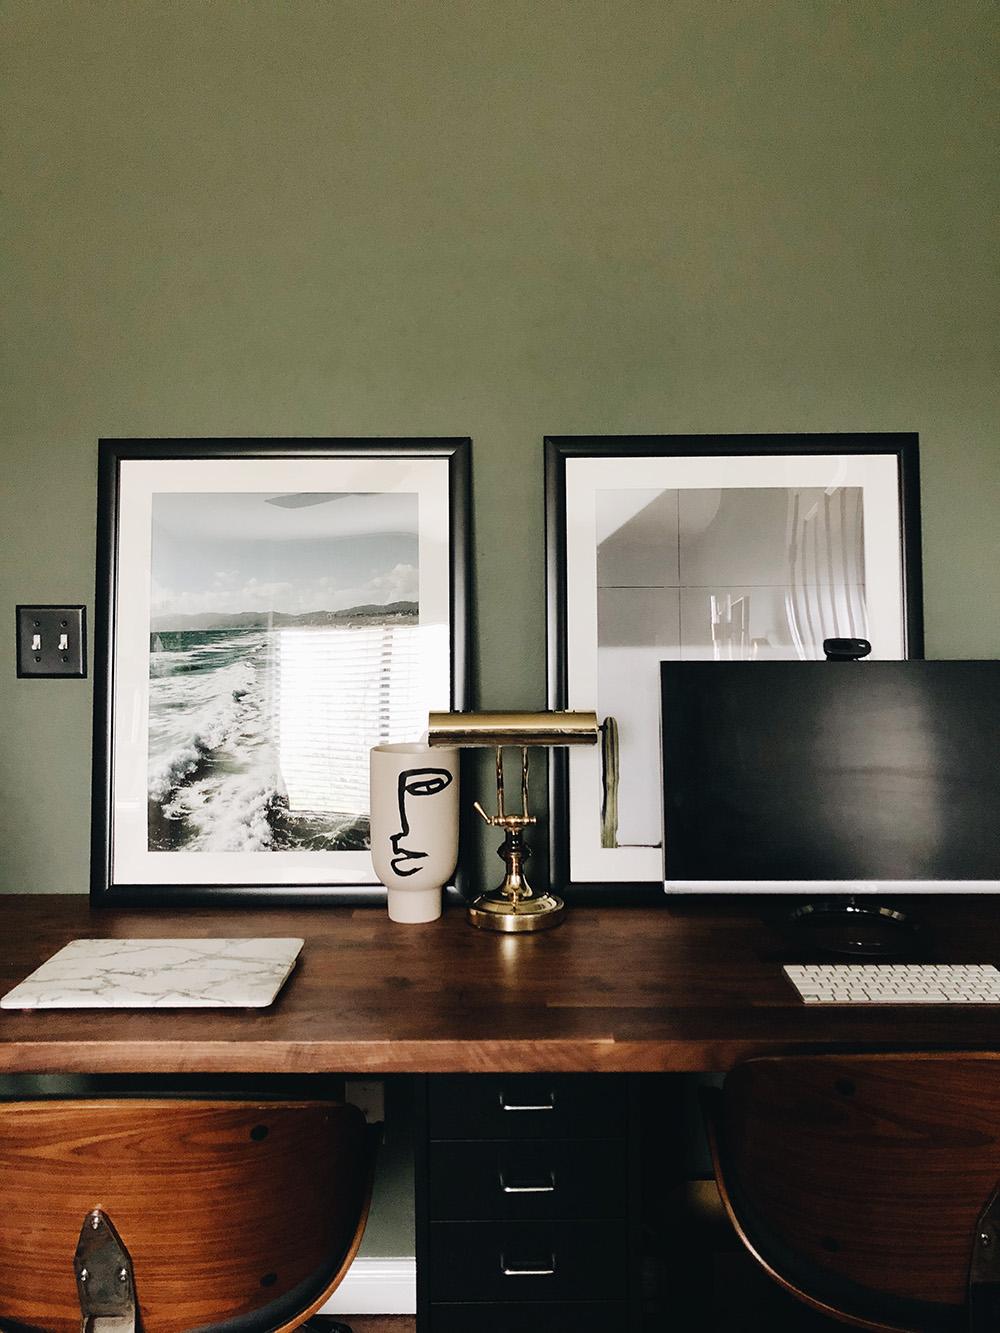 A DIY Ikea Butcher Block Countertop Desk